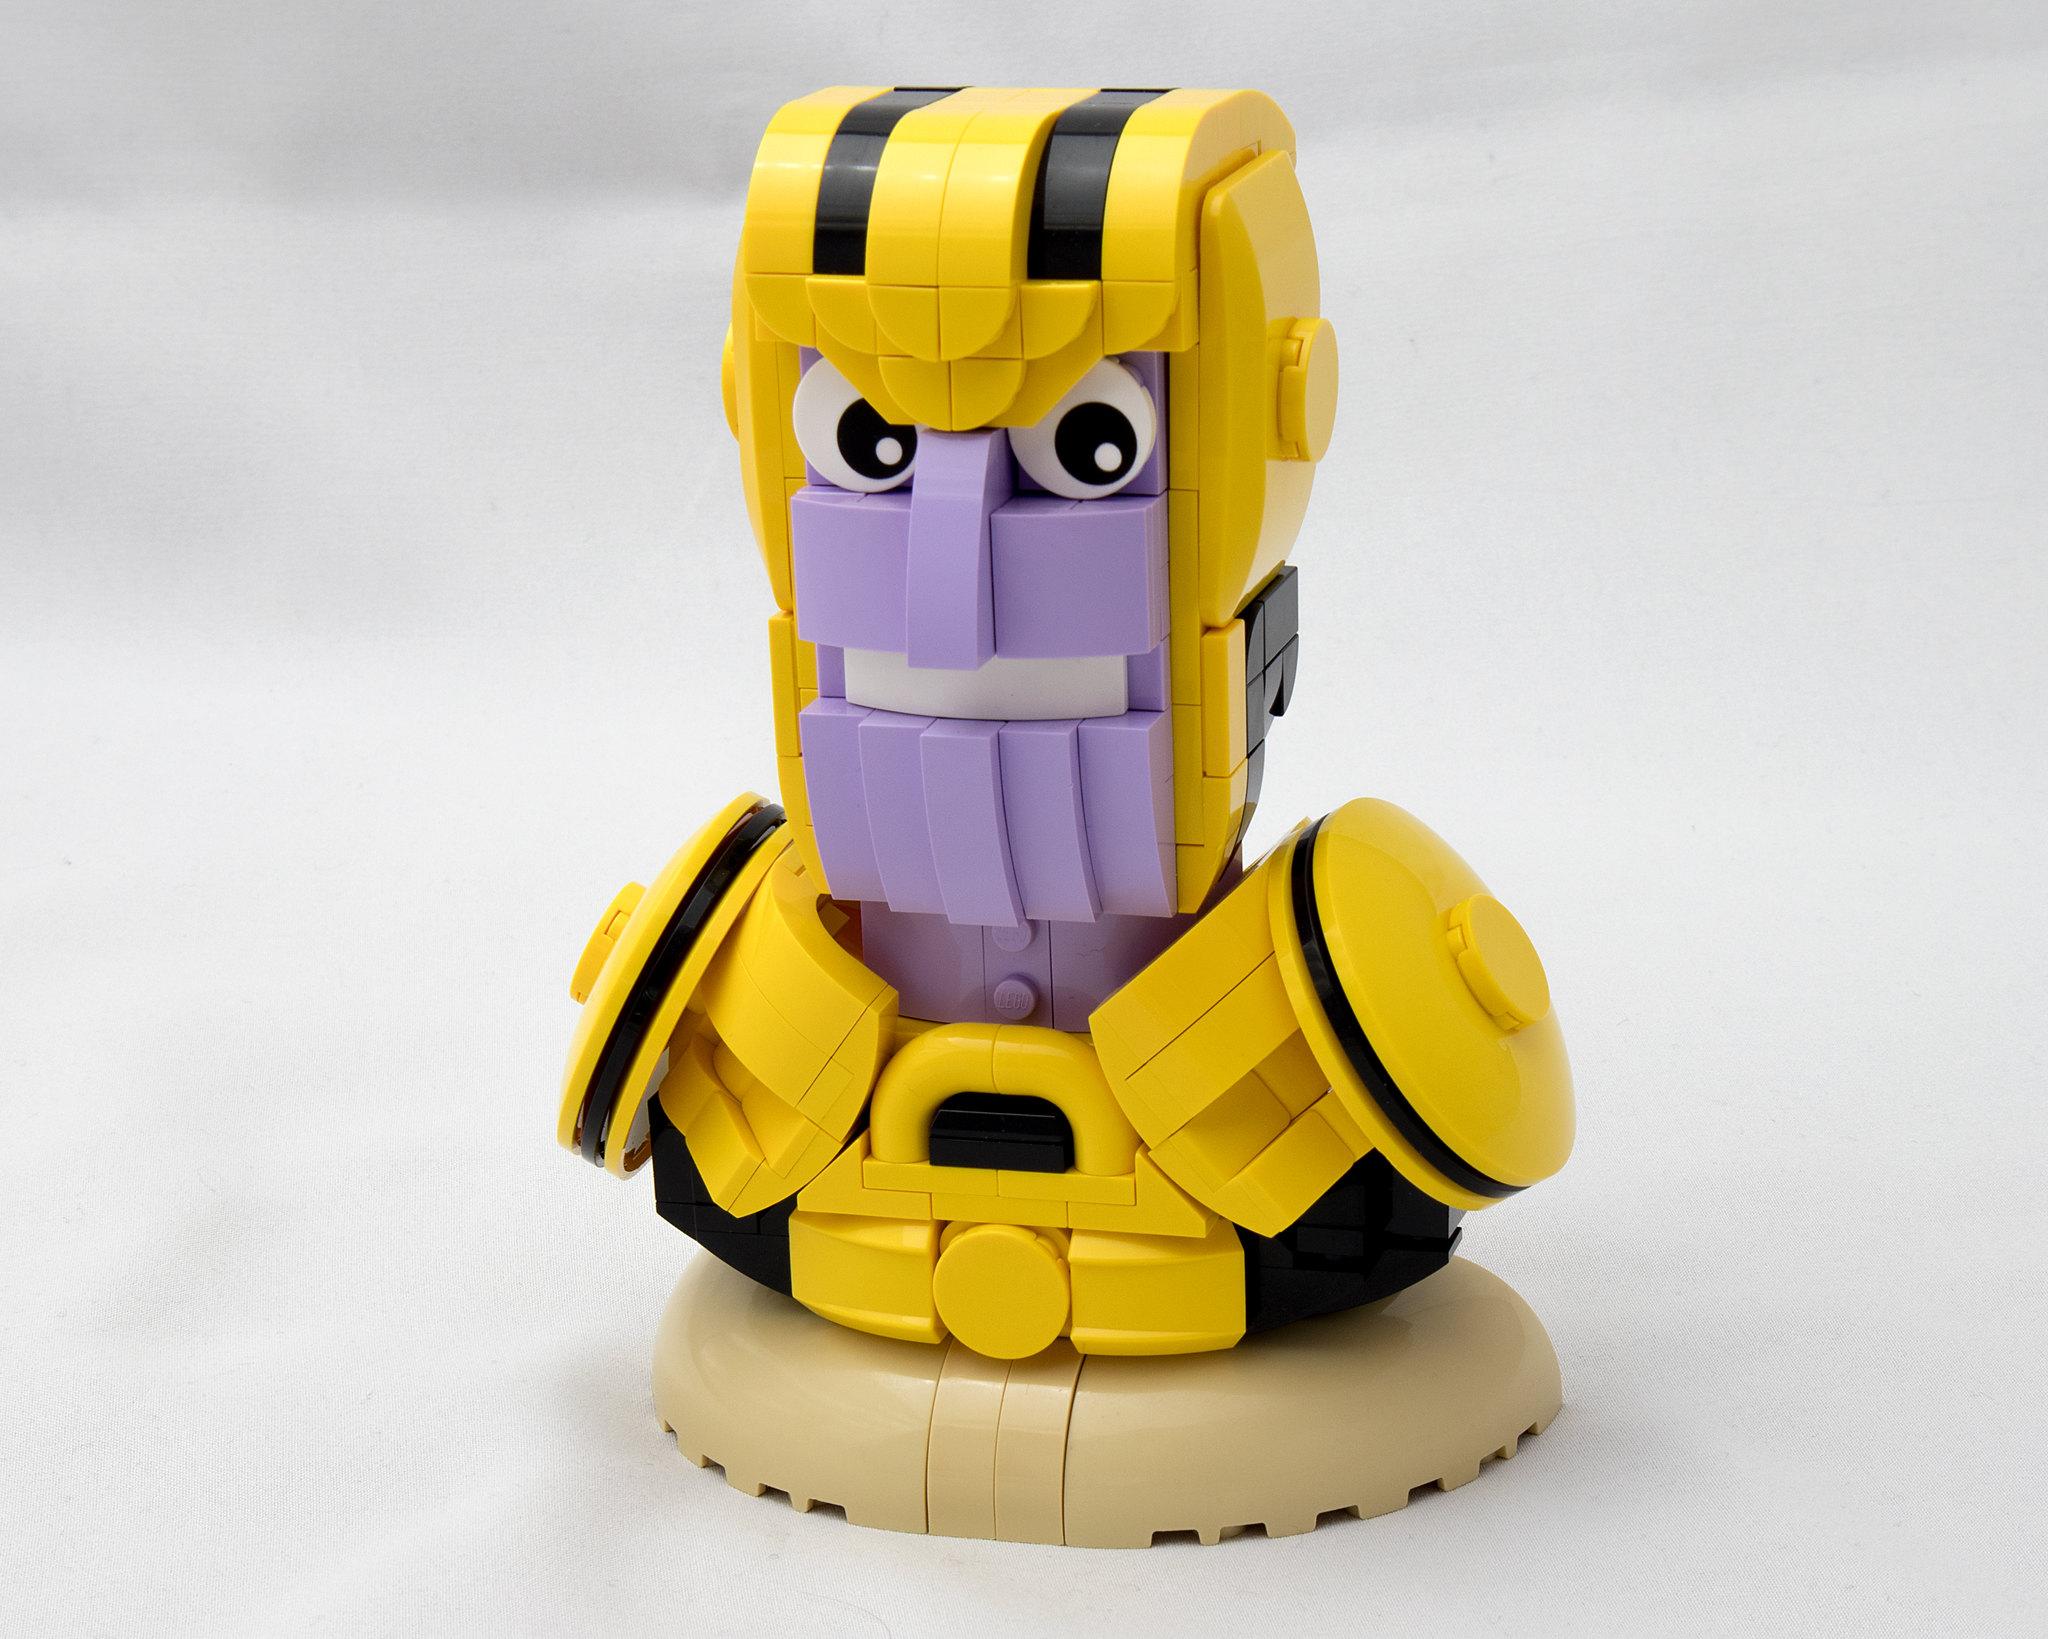 LEGO® MOC by vitreolum: Thanos